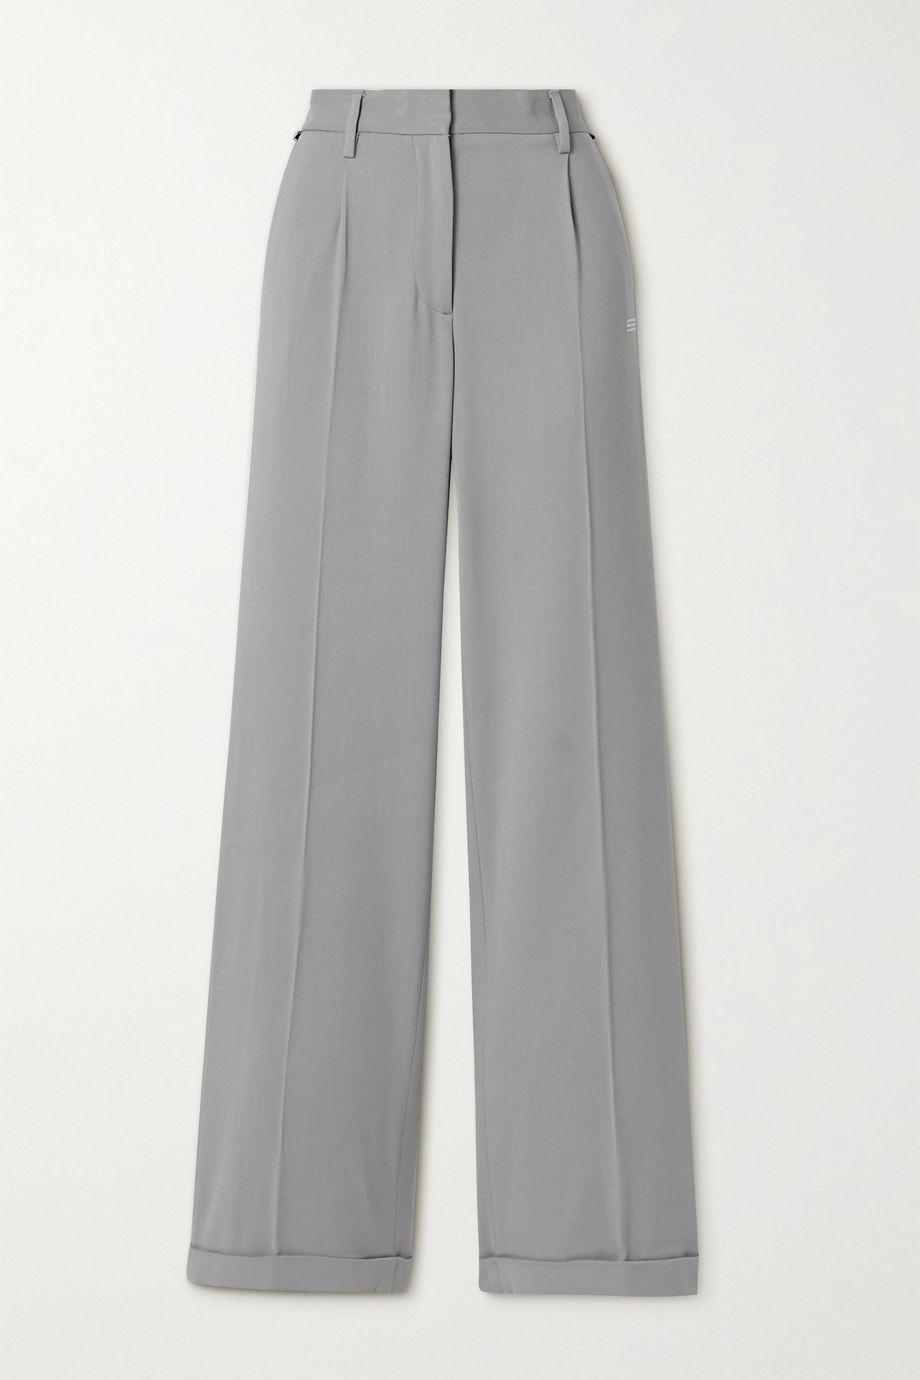 Off-White Printed grain de poudre straight-leg pants